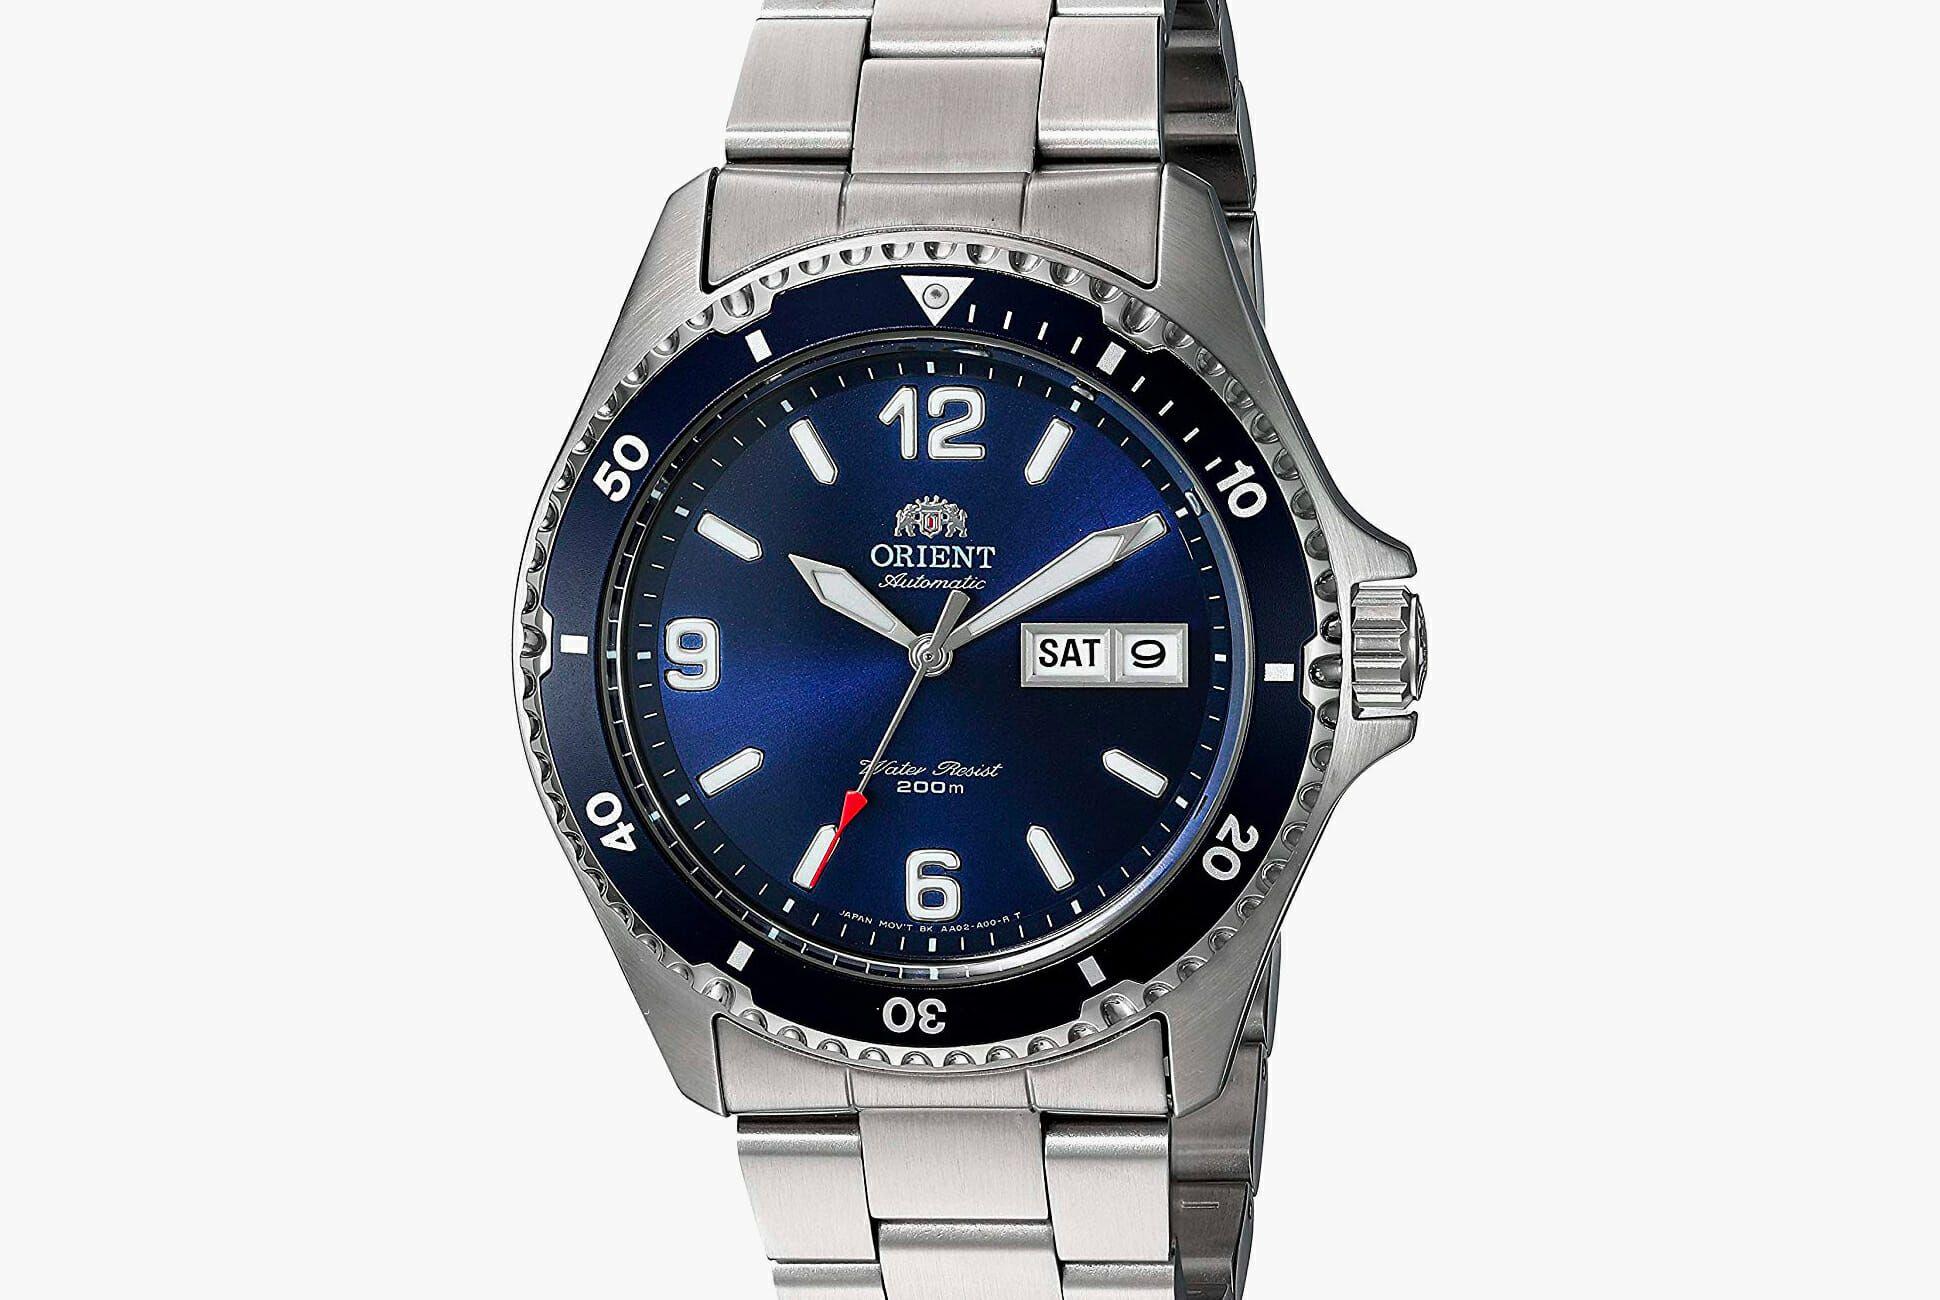 Orient-Mako-gear-patrol-blue